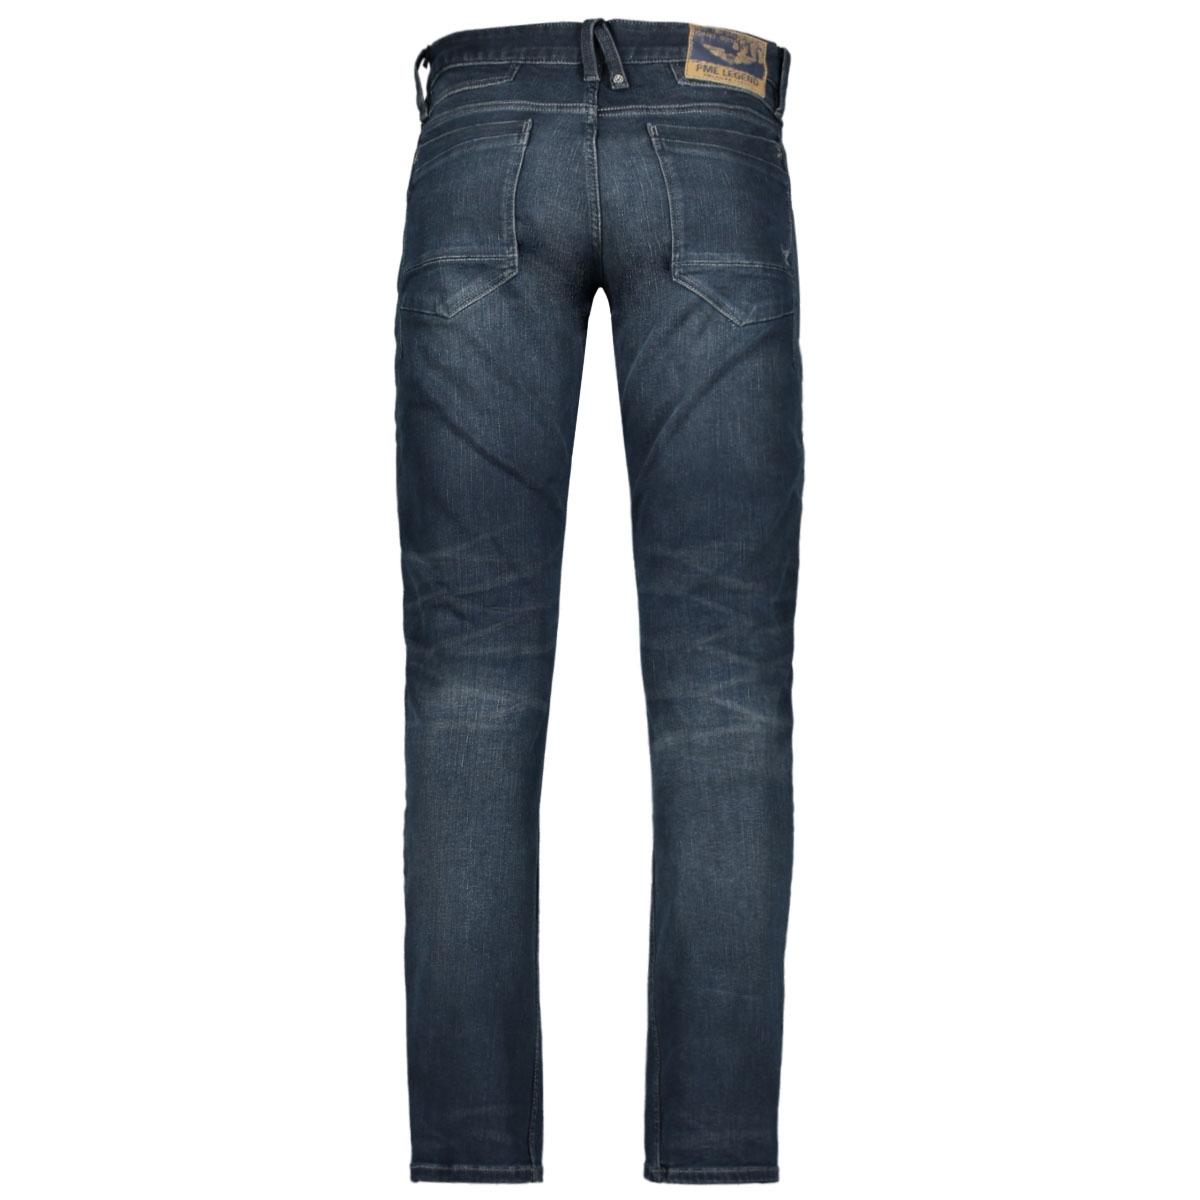 curtis ptr550 pme legend jeans mood indigo dark